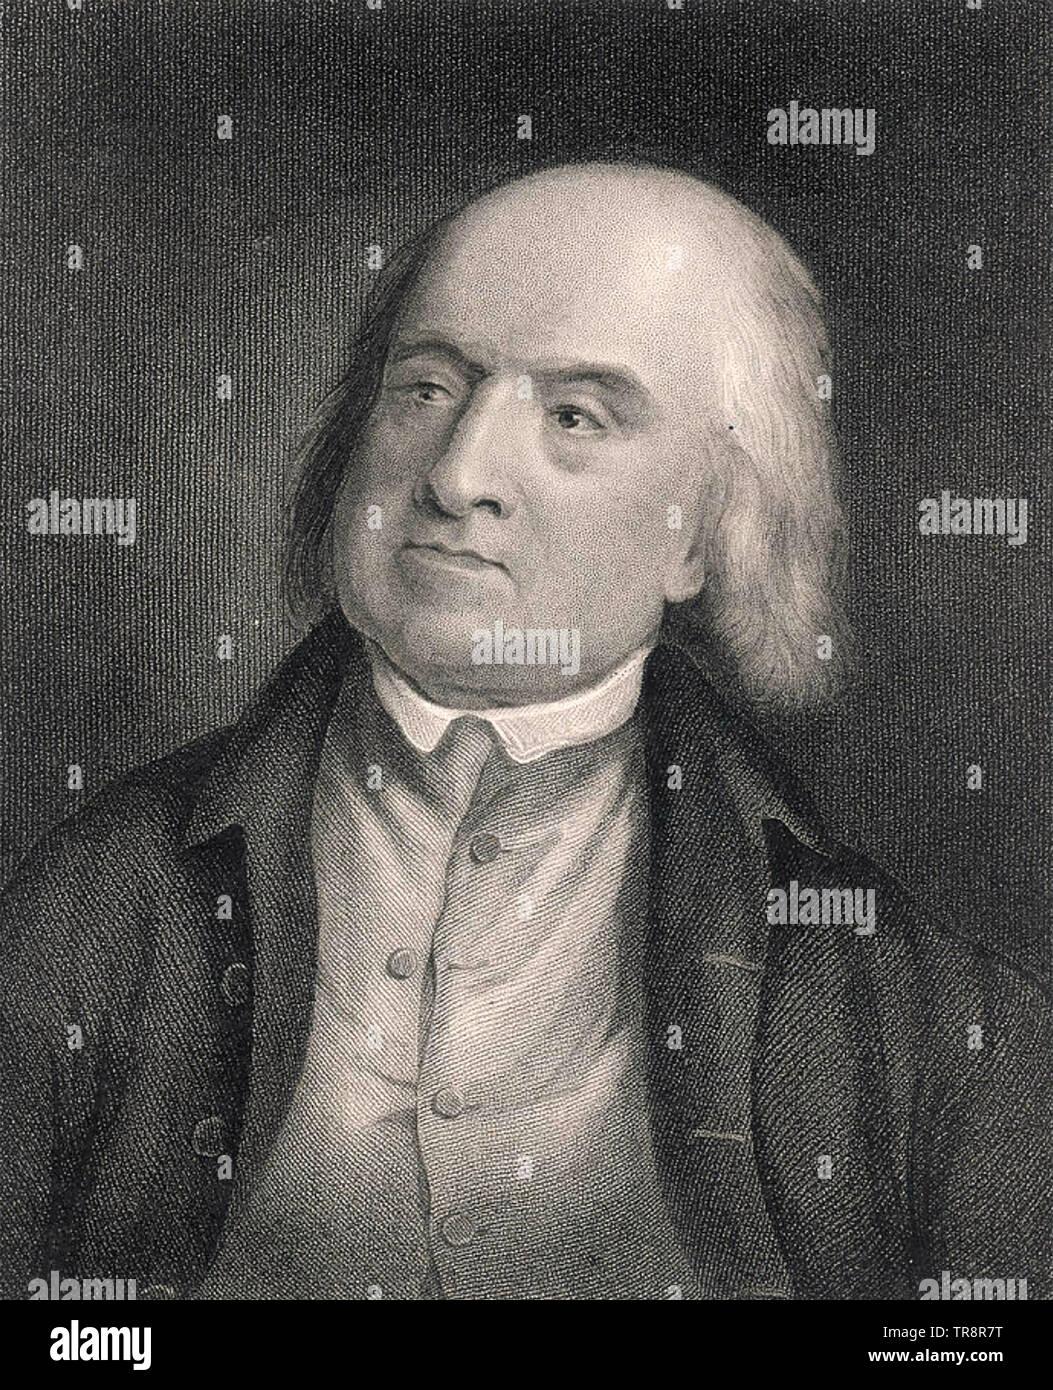 JEREMY BENTHAM (1748-1832) English philosopher, social reformer and jurist - Stock Image